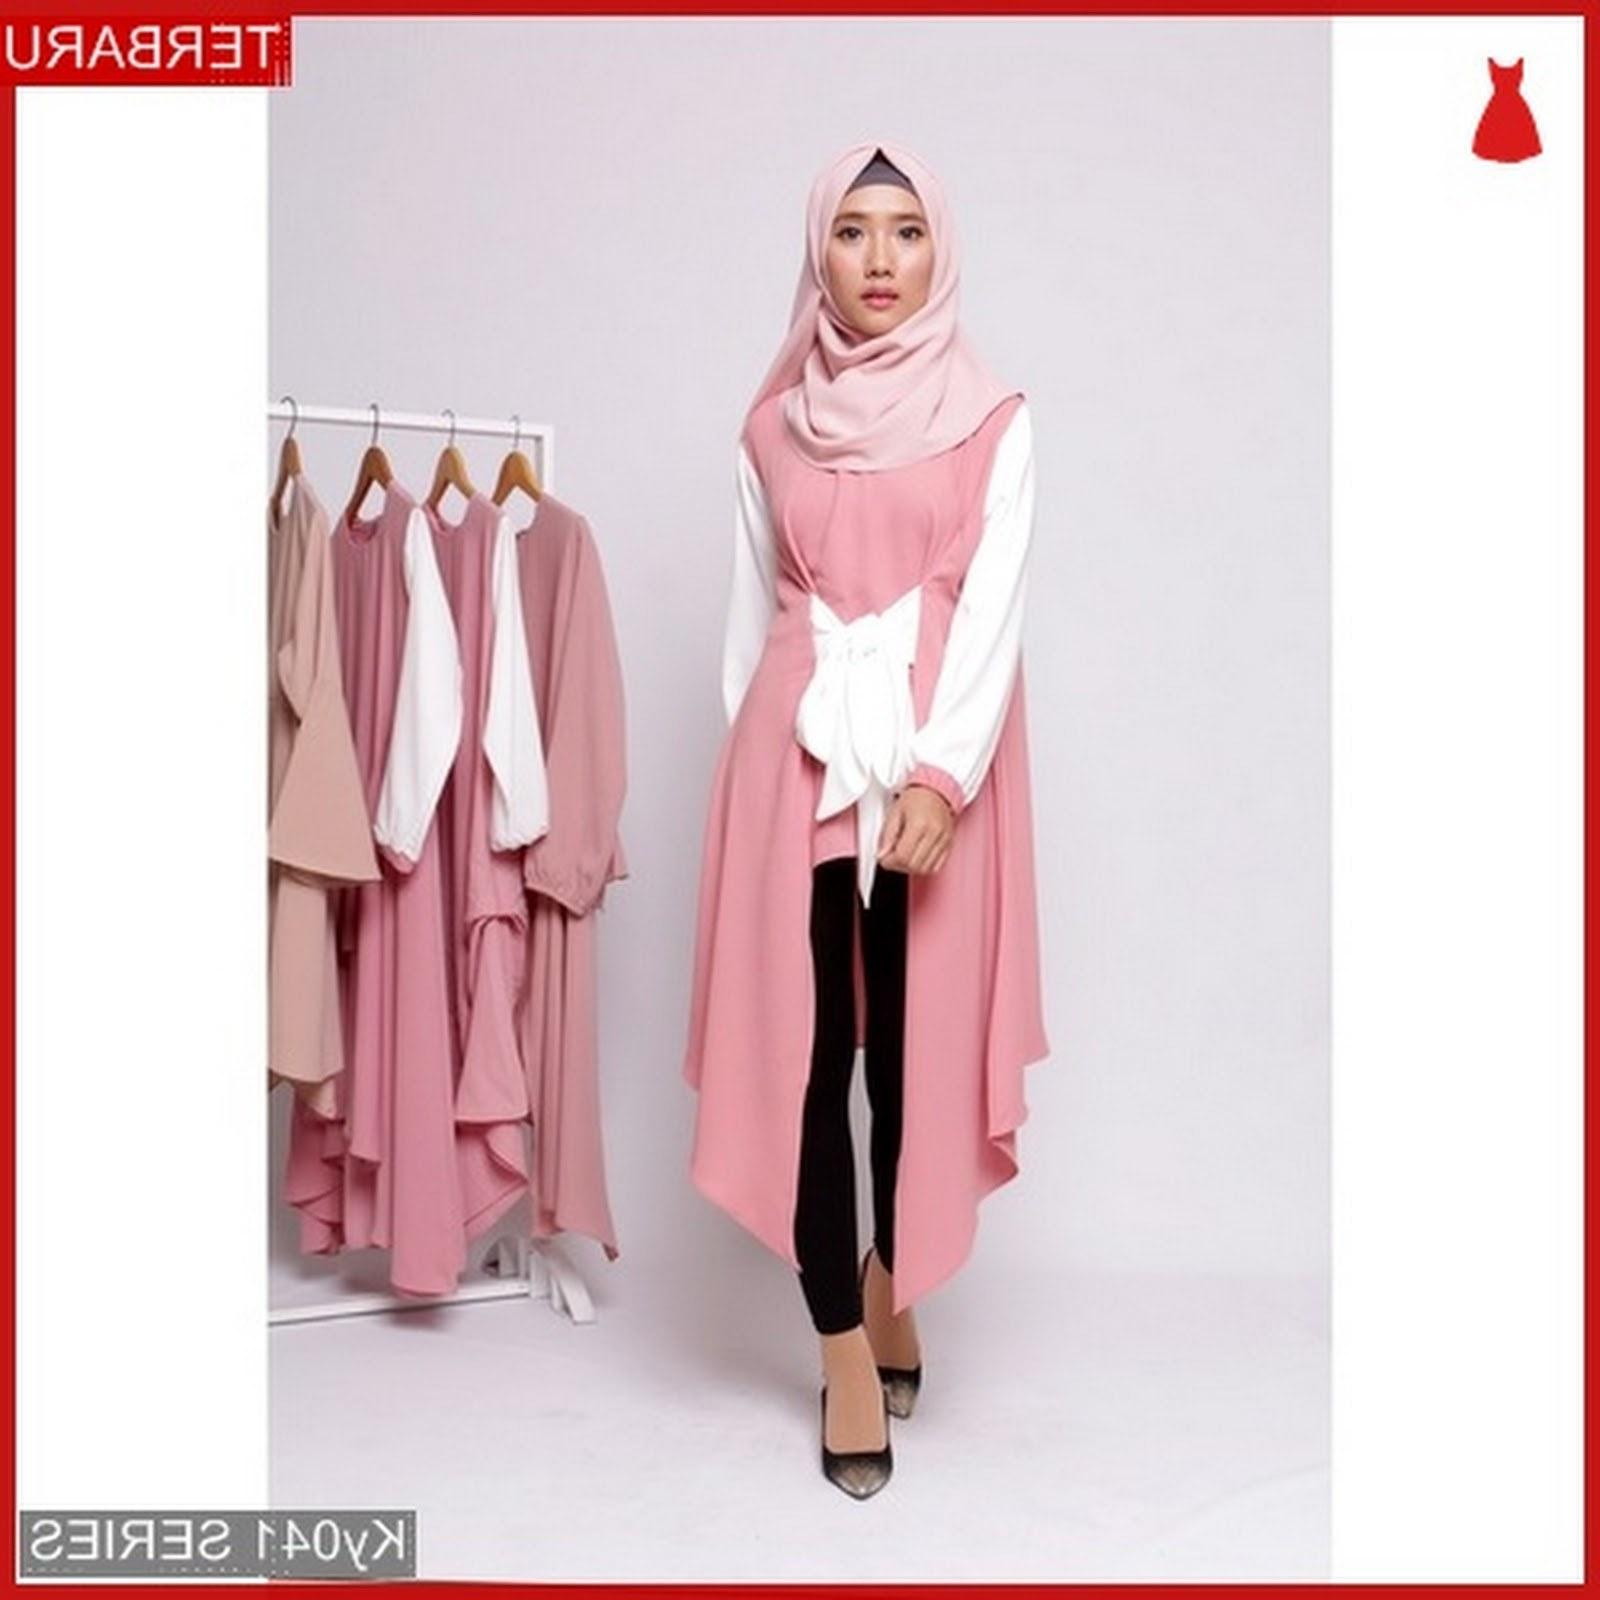 Bentuk Harga Baju Lebaran 3id6 Dapatkan Baju Muslim Lebaran Paling Keren Terbaru Di Bmg